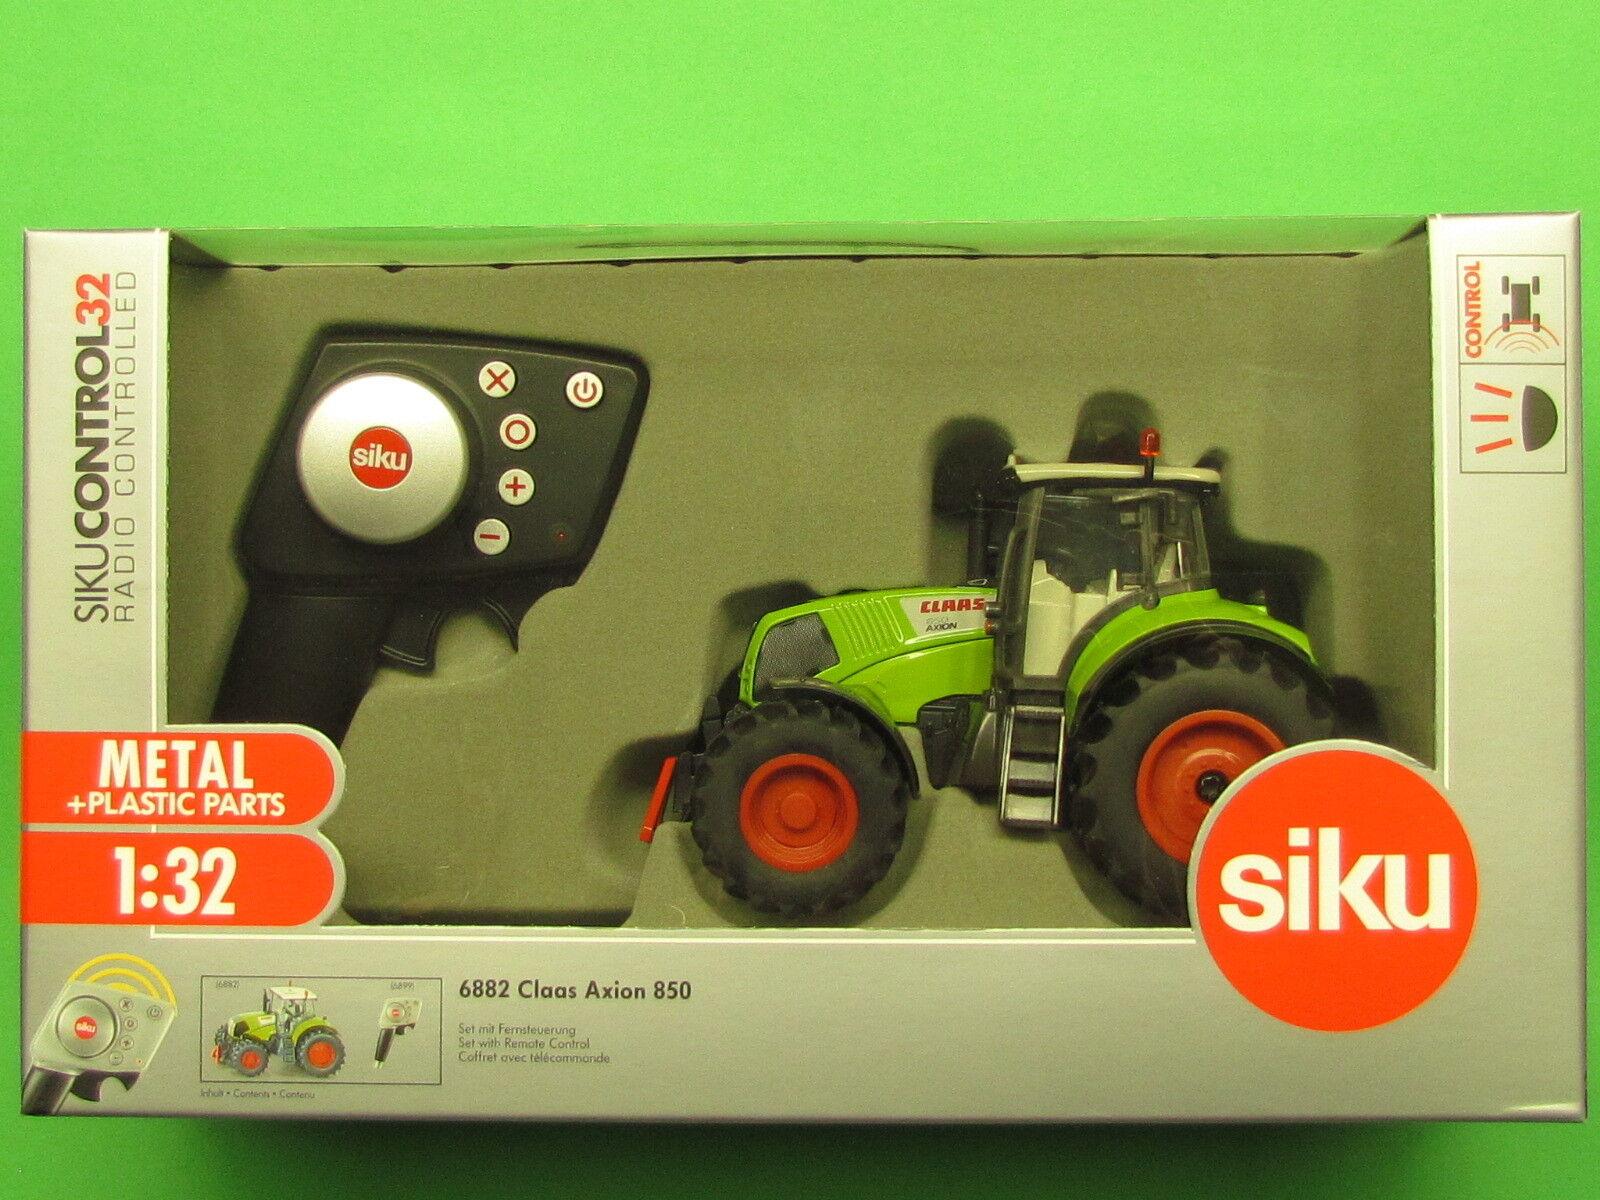 1 32 Siku Control 6882 Claas Axion 850 Set Blitzversand per DHL-Paket  |  Neuer Markt